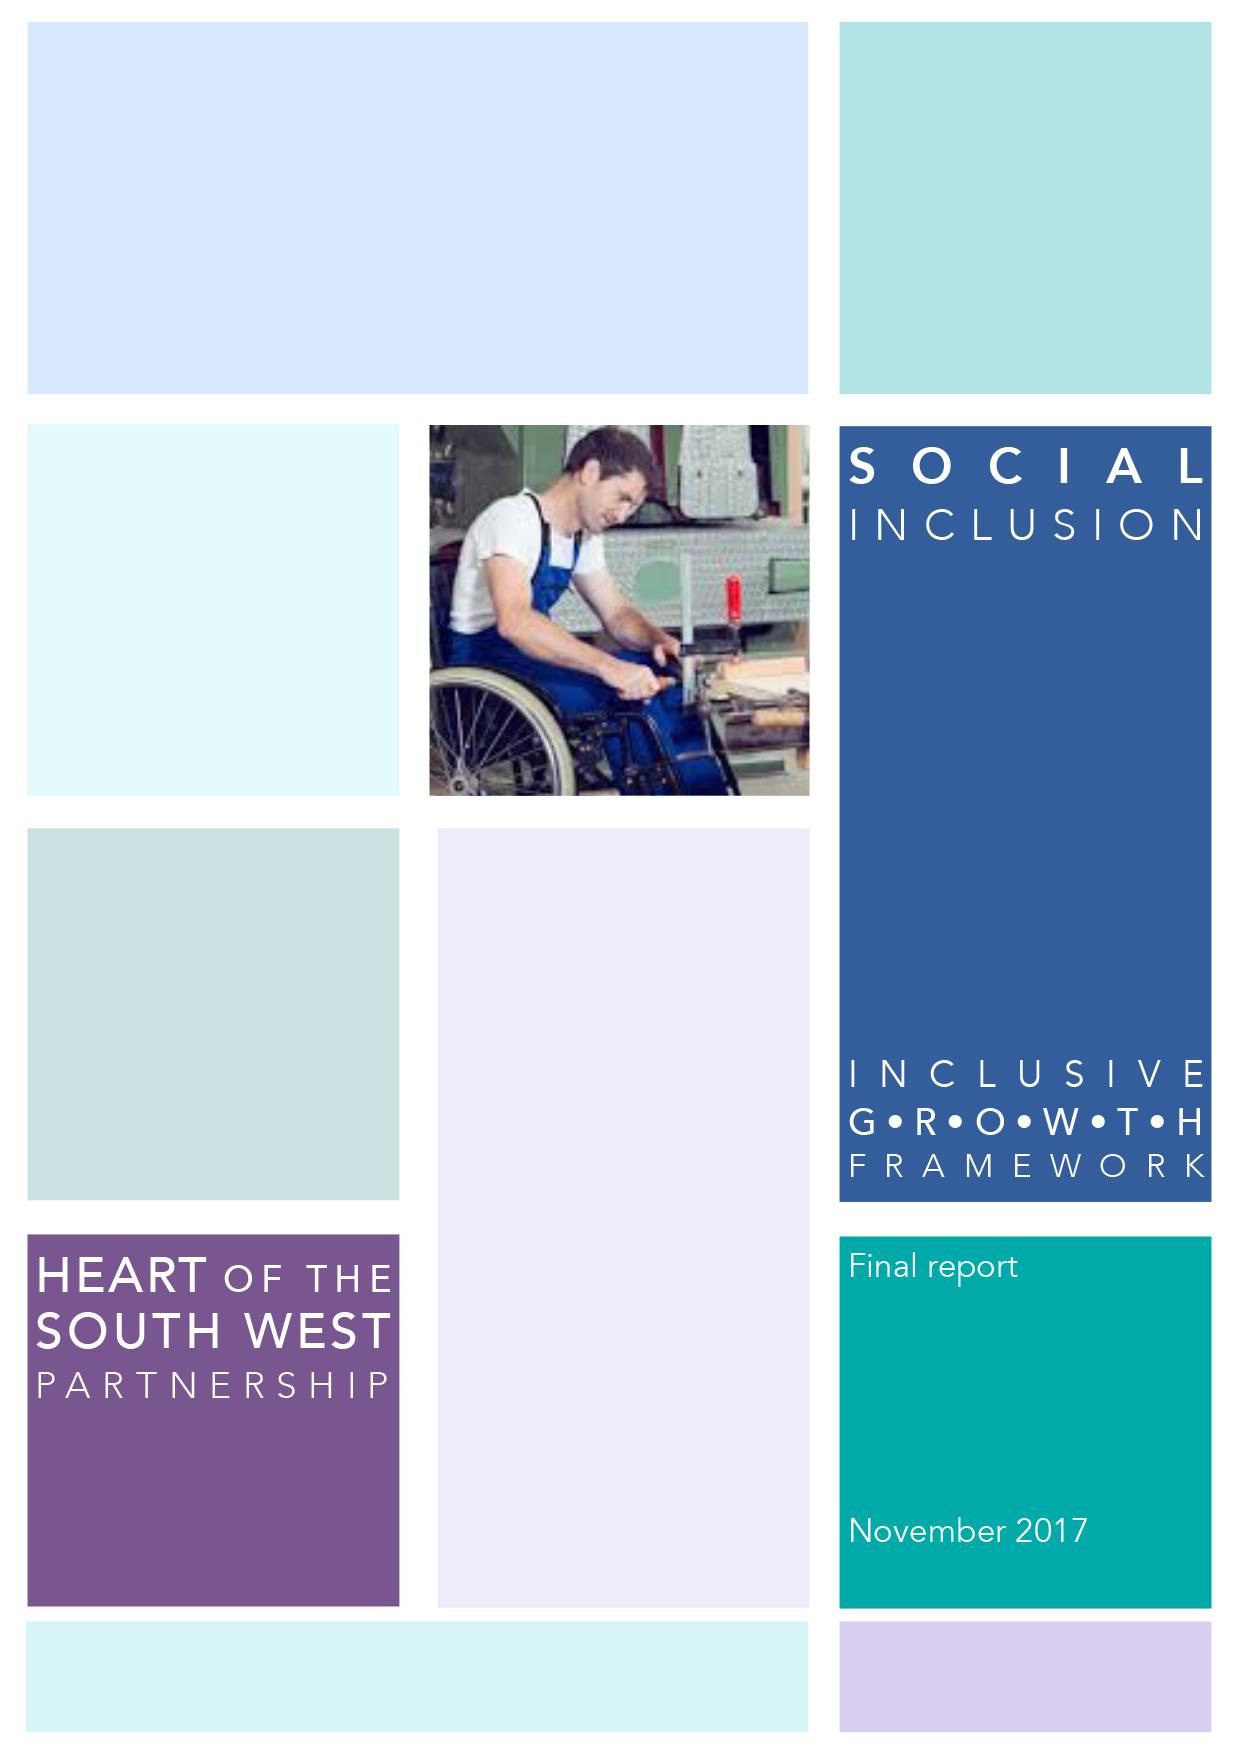 Inclusive Growth Framework - Final Report - 1117